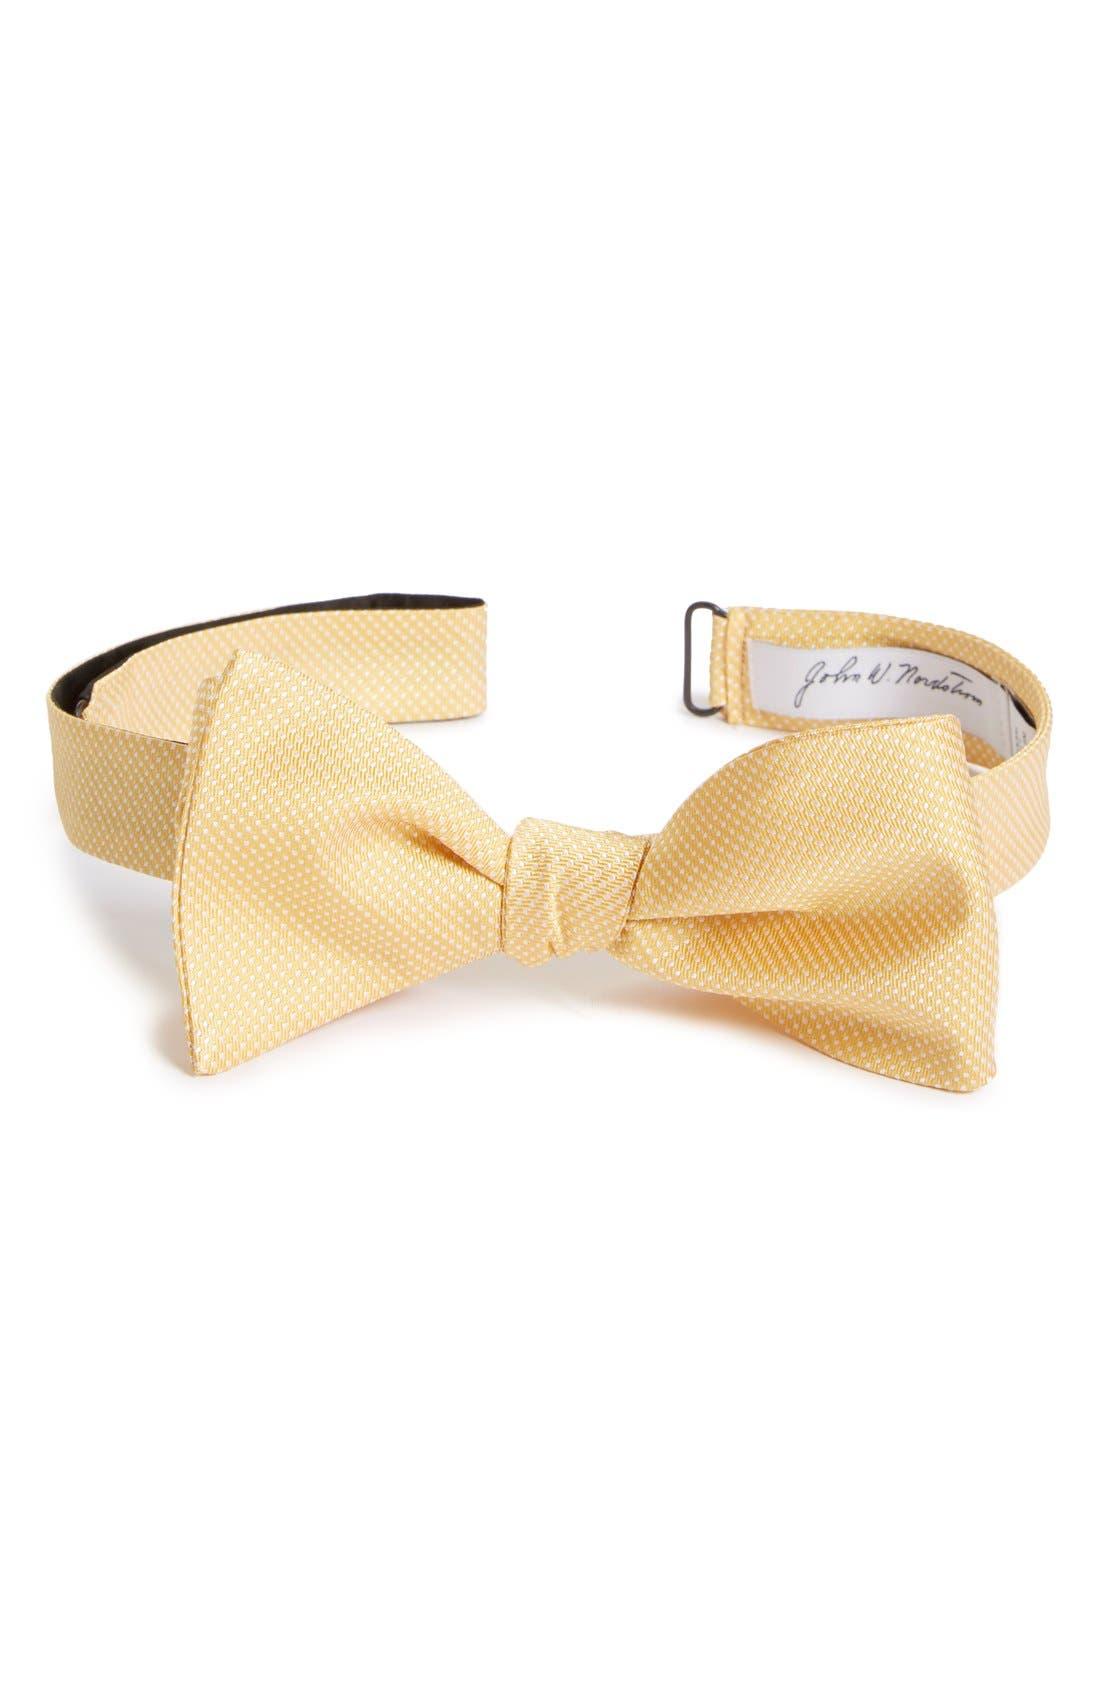 Dot Silk Bow Tie,                             Main thumbnail 1, color,                             Yellow